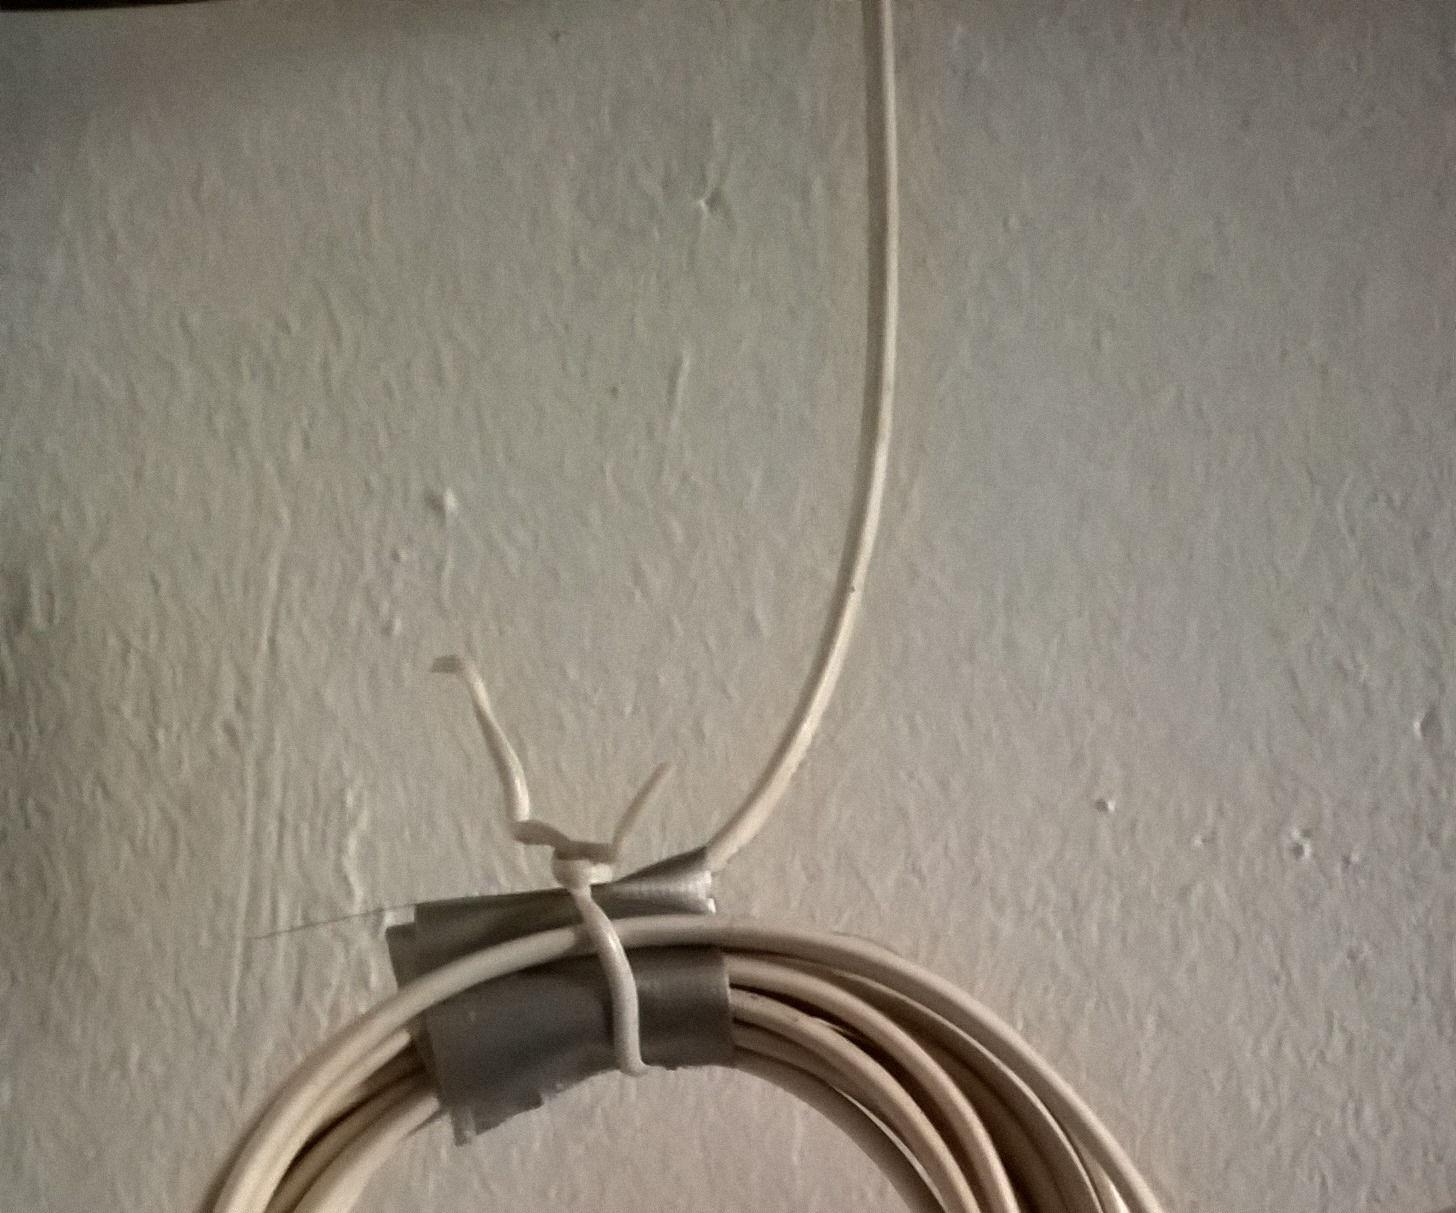 Improve ADSL broadband performance